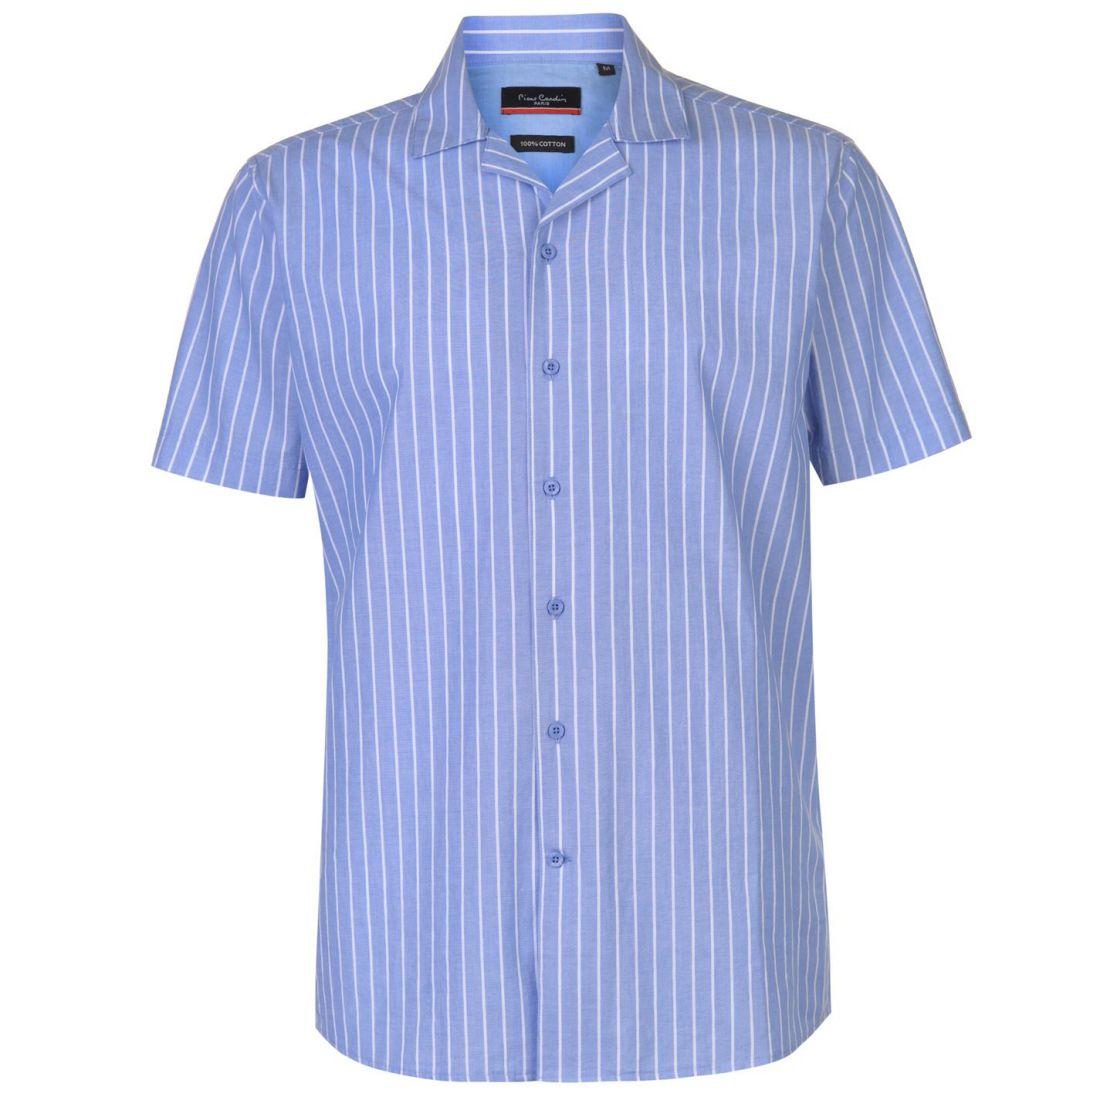 Pierre Cardin Reverse Stripe Shirt Mens Gents Short Sleeve Everyday Lightweight